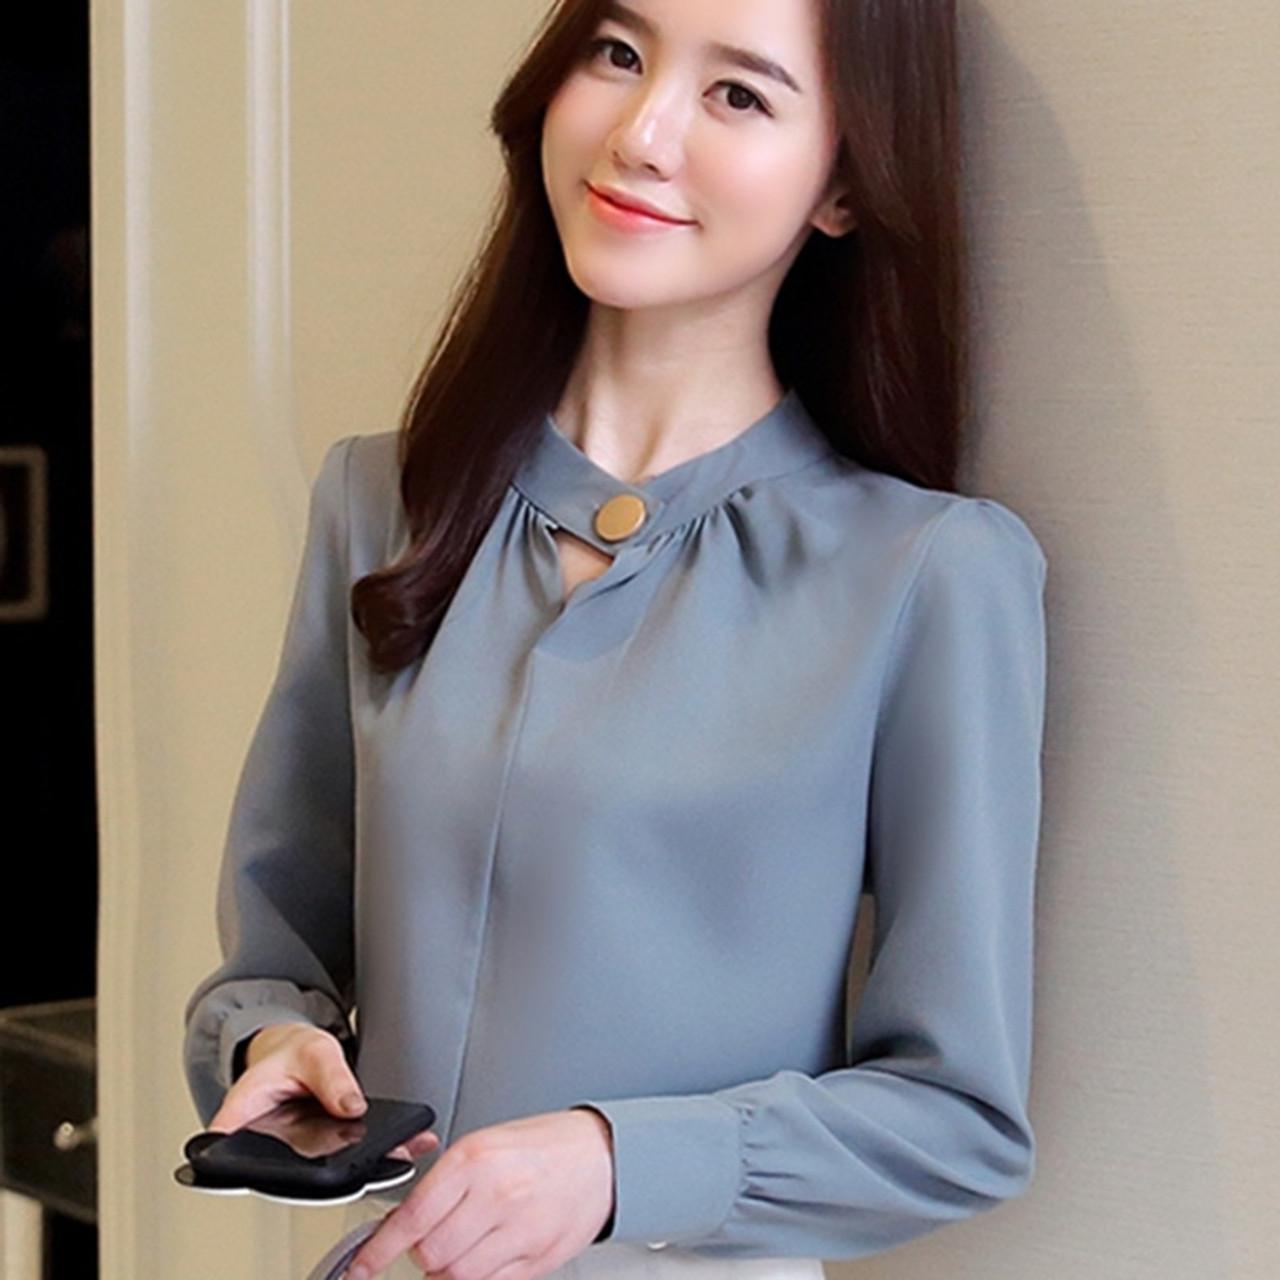 cb58fc0ea10 ... New Autumn 2018 Womens Tops and Blouses Long Sleeve Chiffon Blouse  Ladies Tops Women Shirts Shirt ...